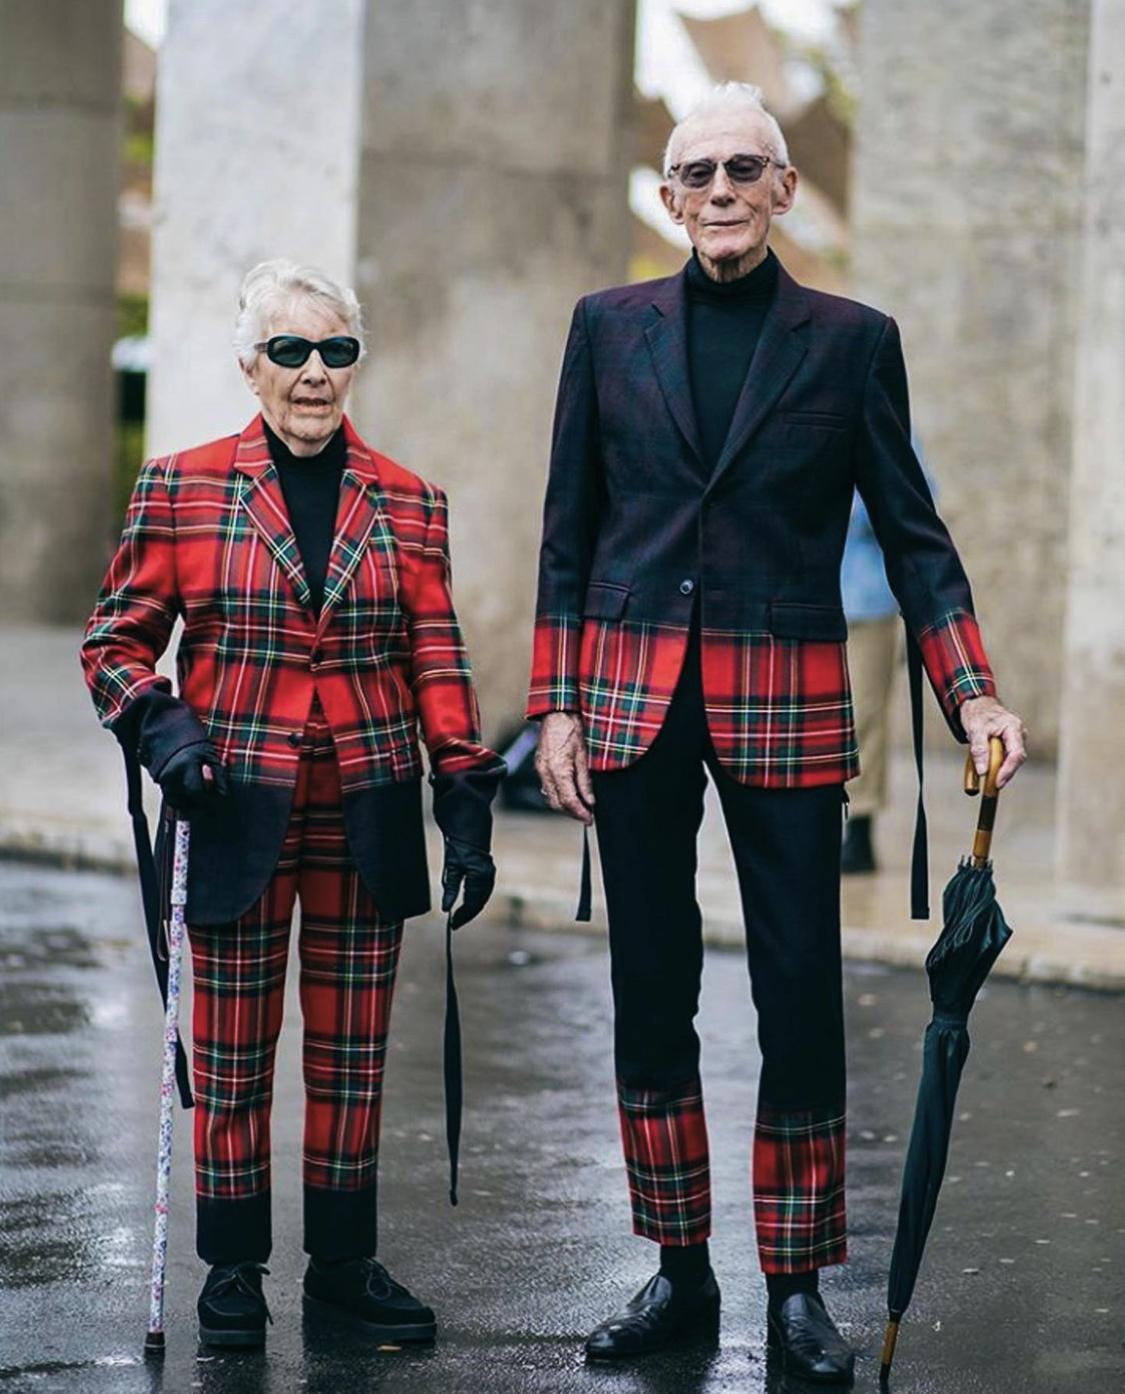 Sọc caro tartan truyền thống scotland